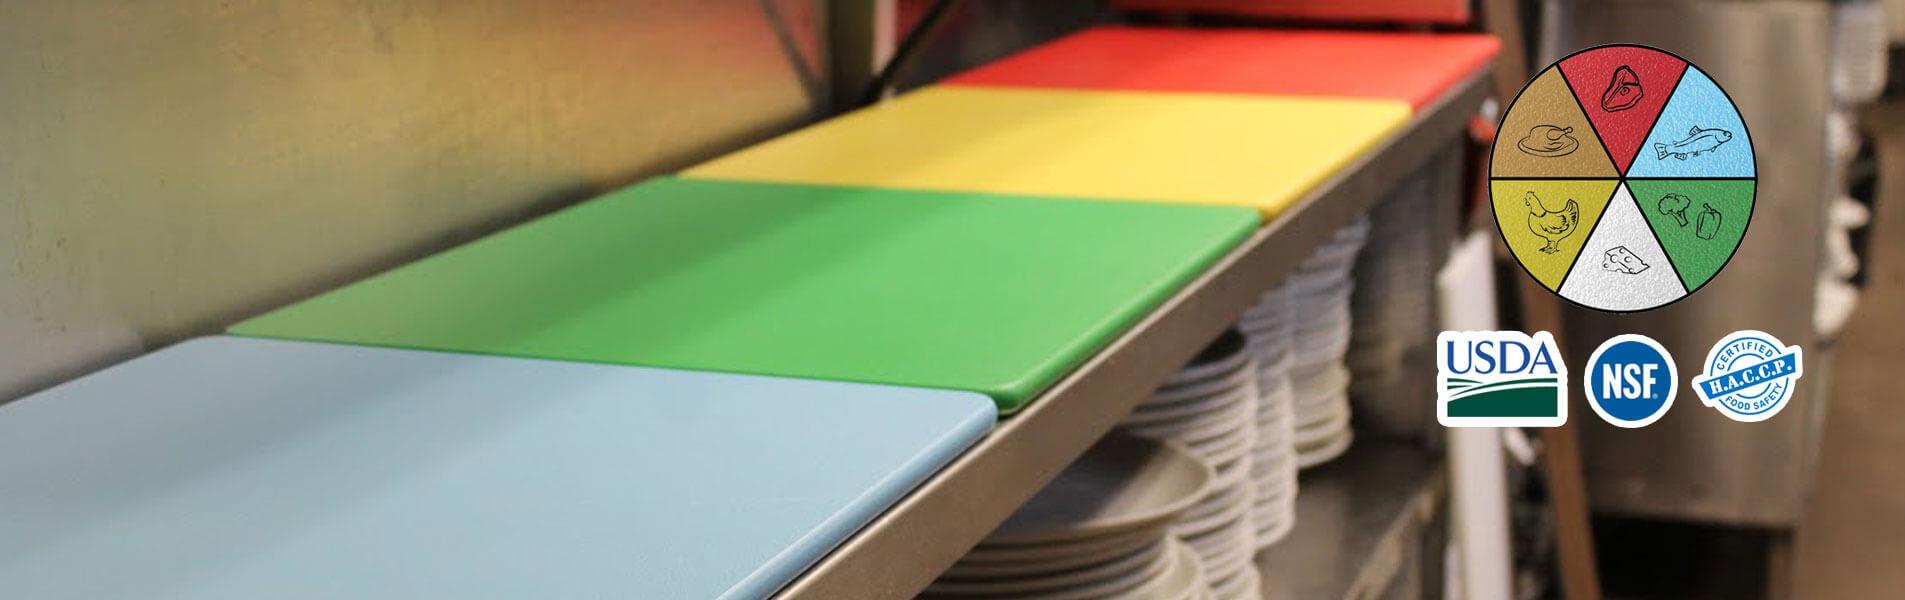 color cutting boards, plastic cutting board, cutting board company